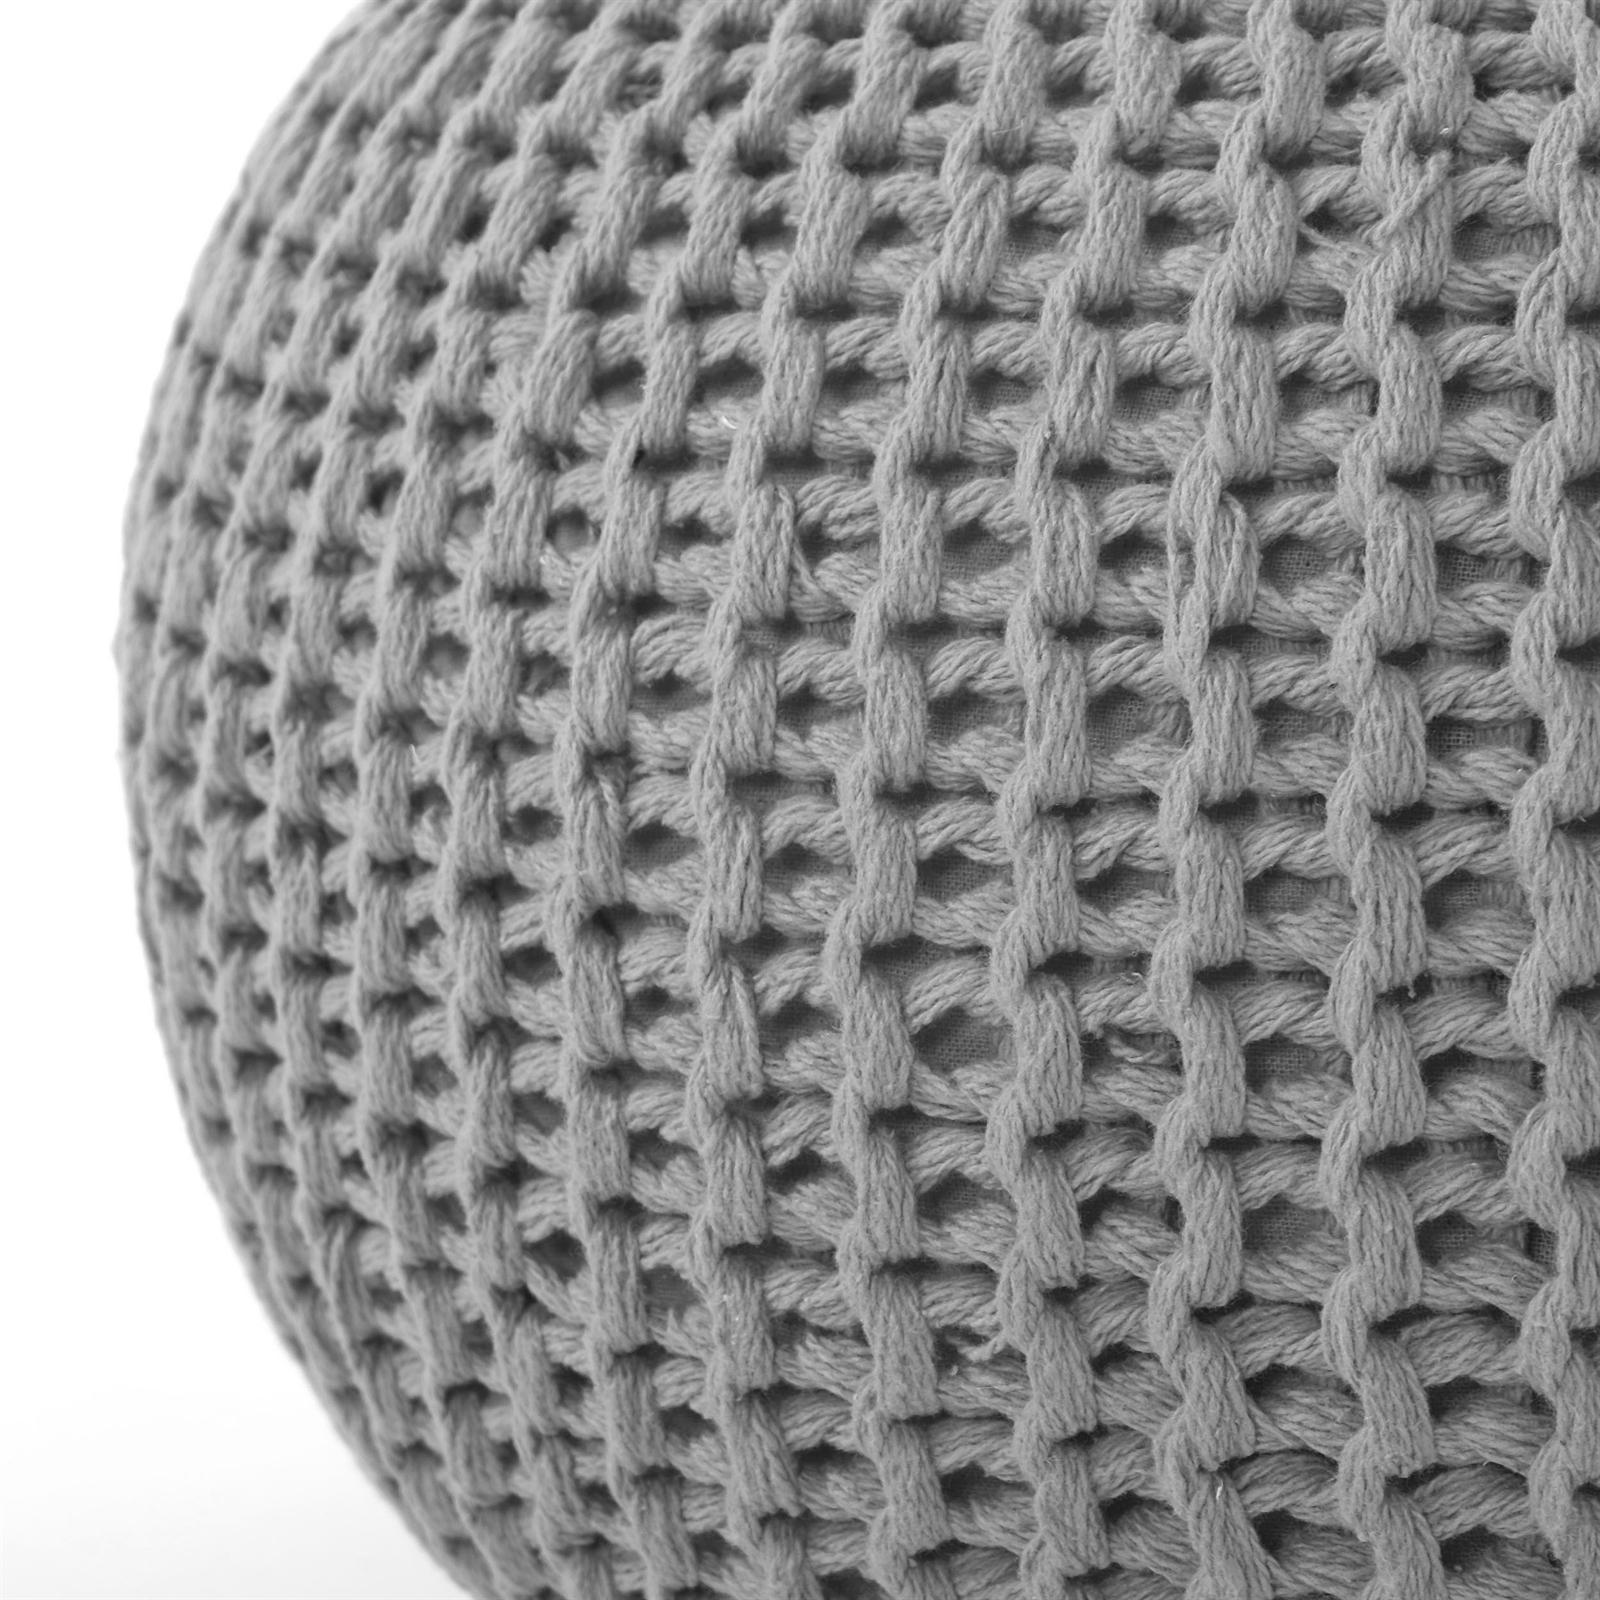 baumwoll pouf lotte 50 cm grau strick fu hocker sitzhocker eur 49 95 picclick de. Black Bedroom Furniture Sets. Home Design Ideas